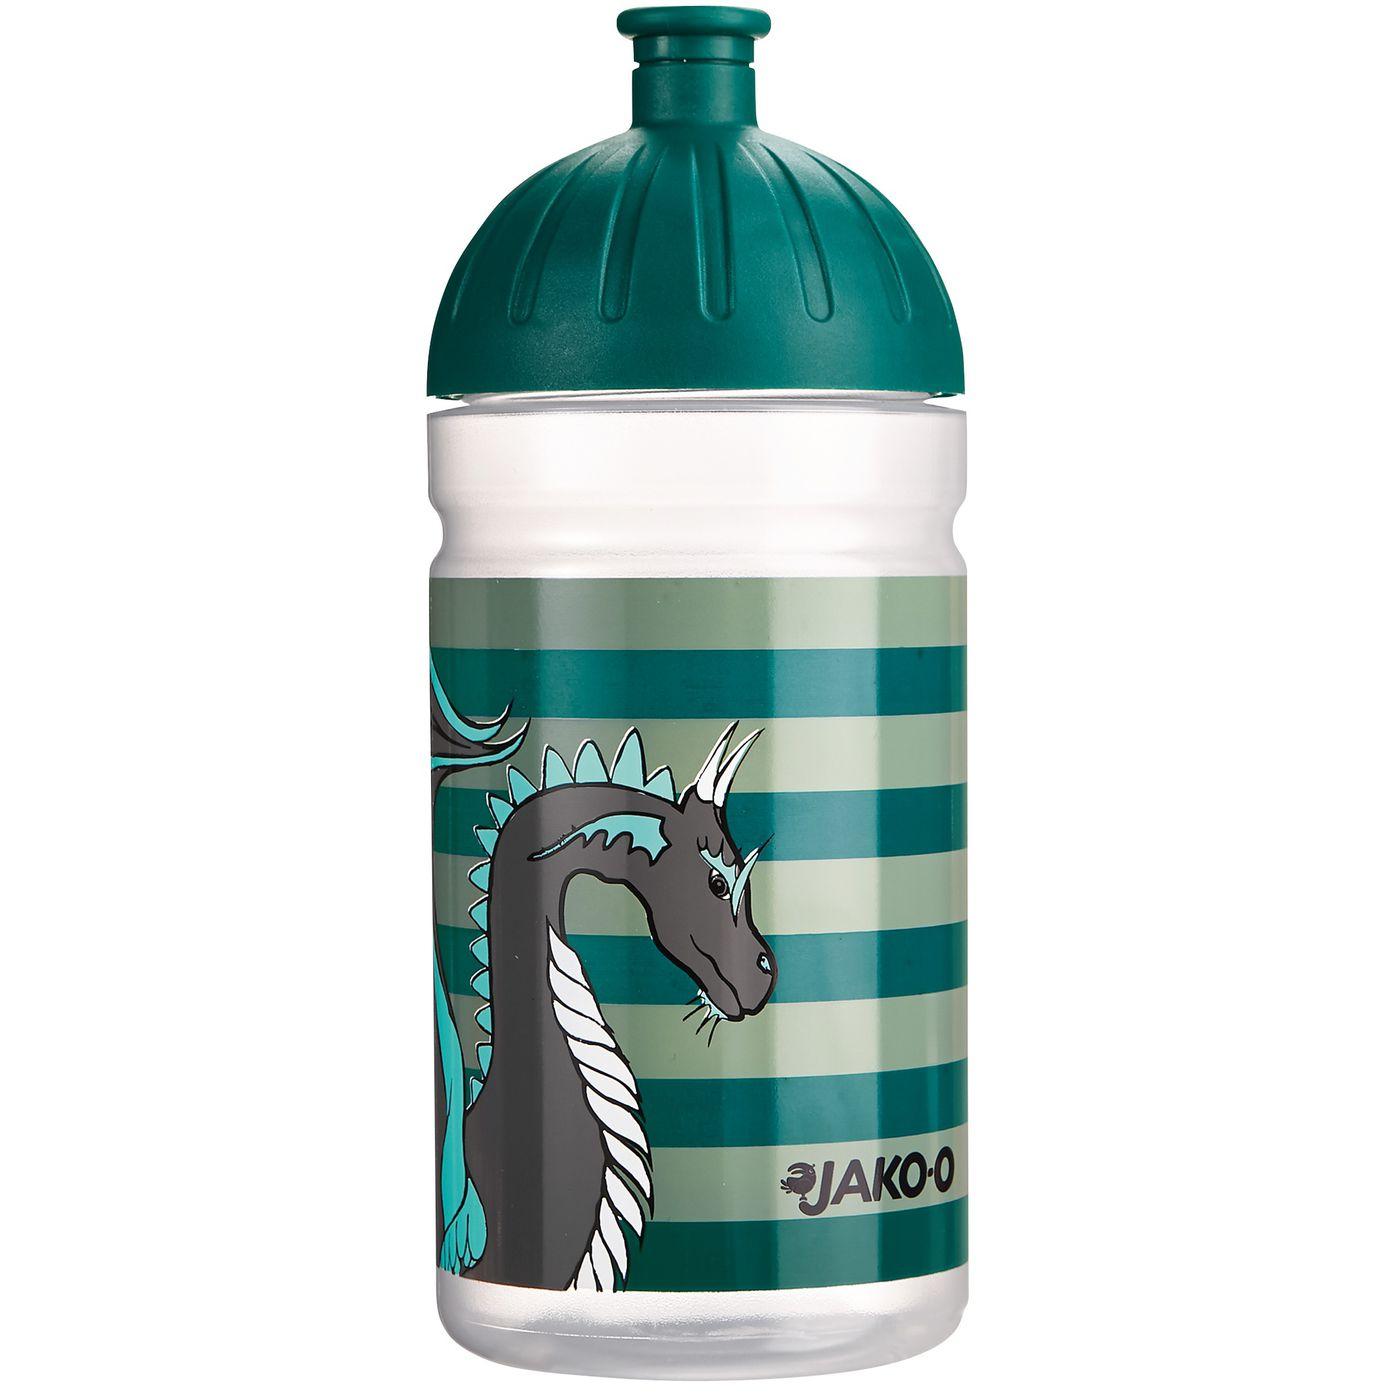 Бутылку JAKO‑O, 0,5 л